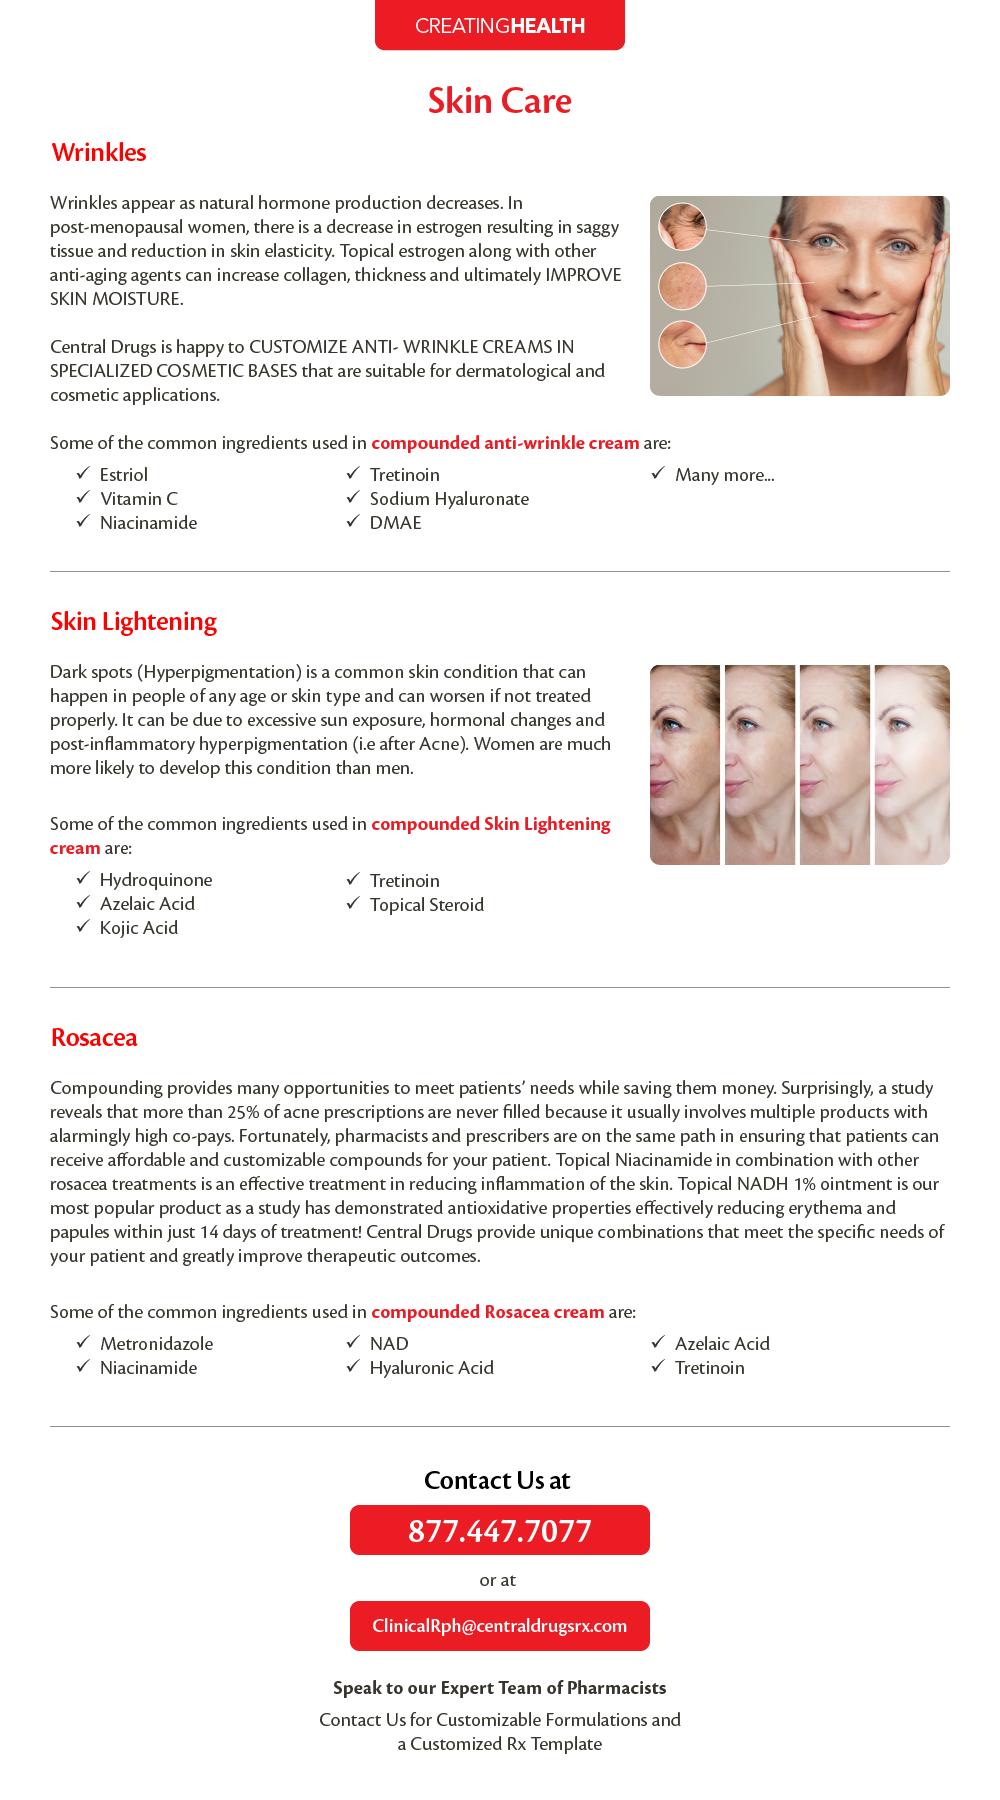 Skin Care info for website.png